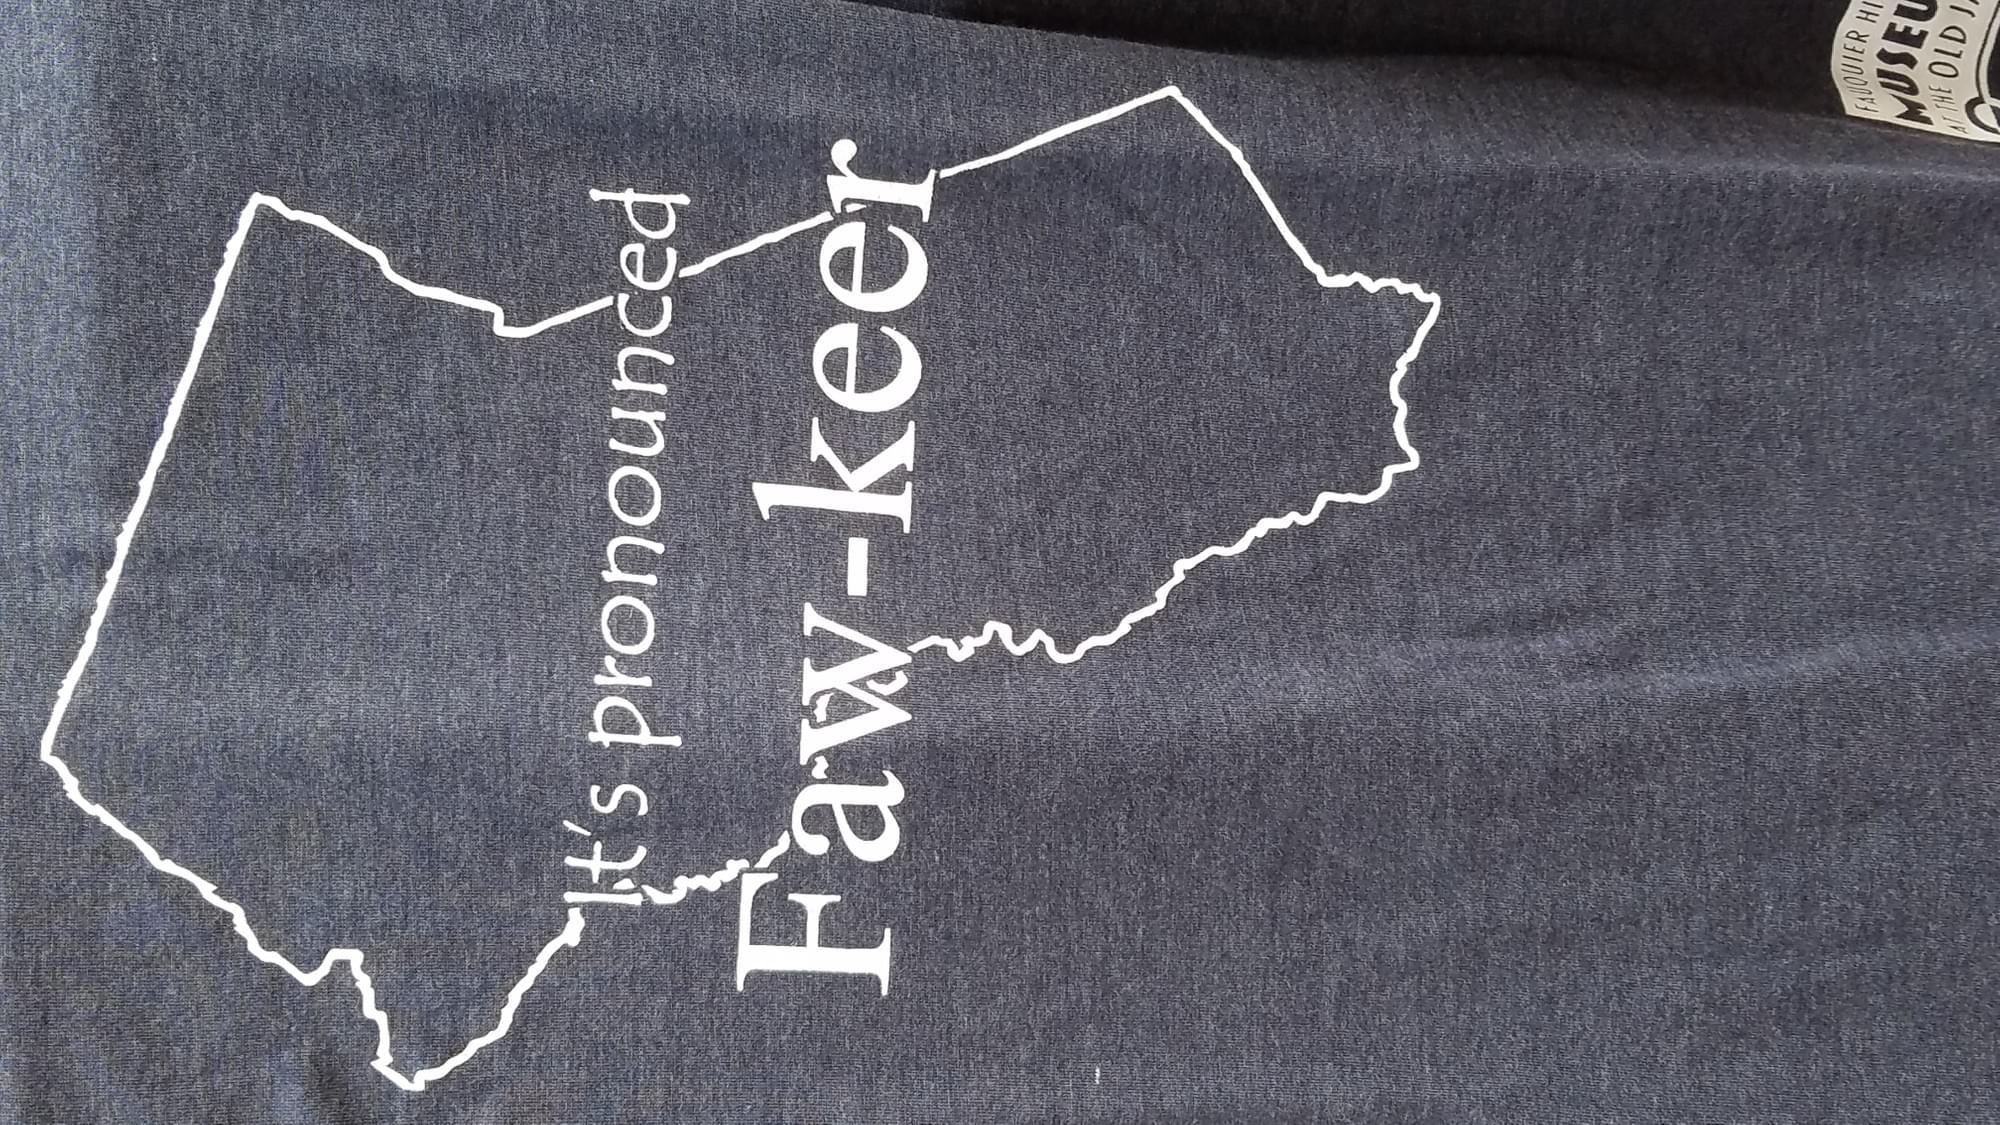 [Faw-Keer] XXL Long Sleeve Hooded T-shirts